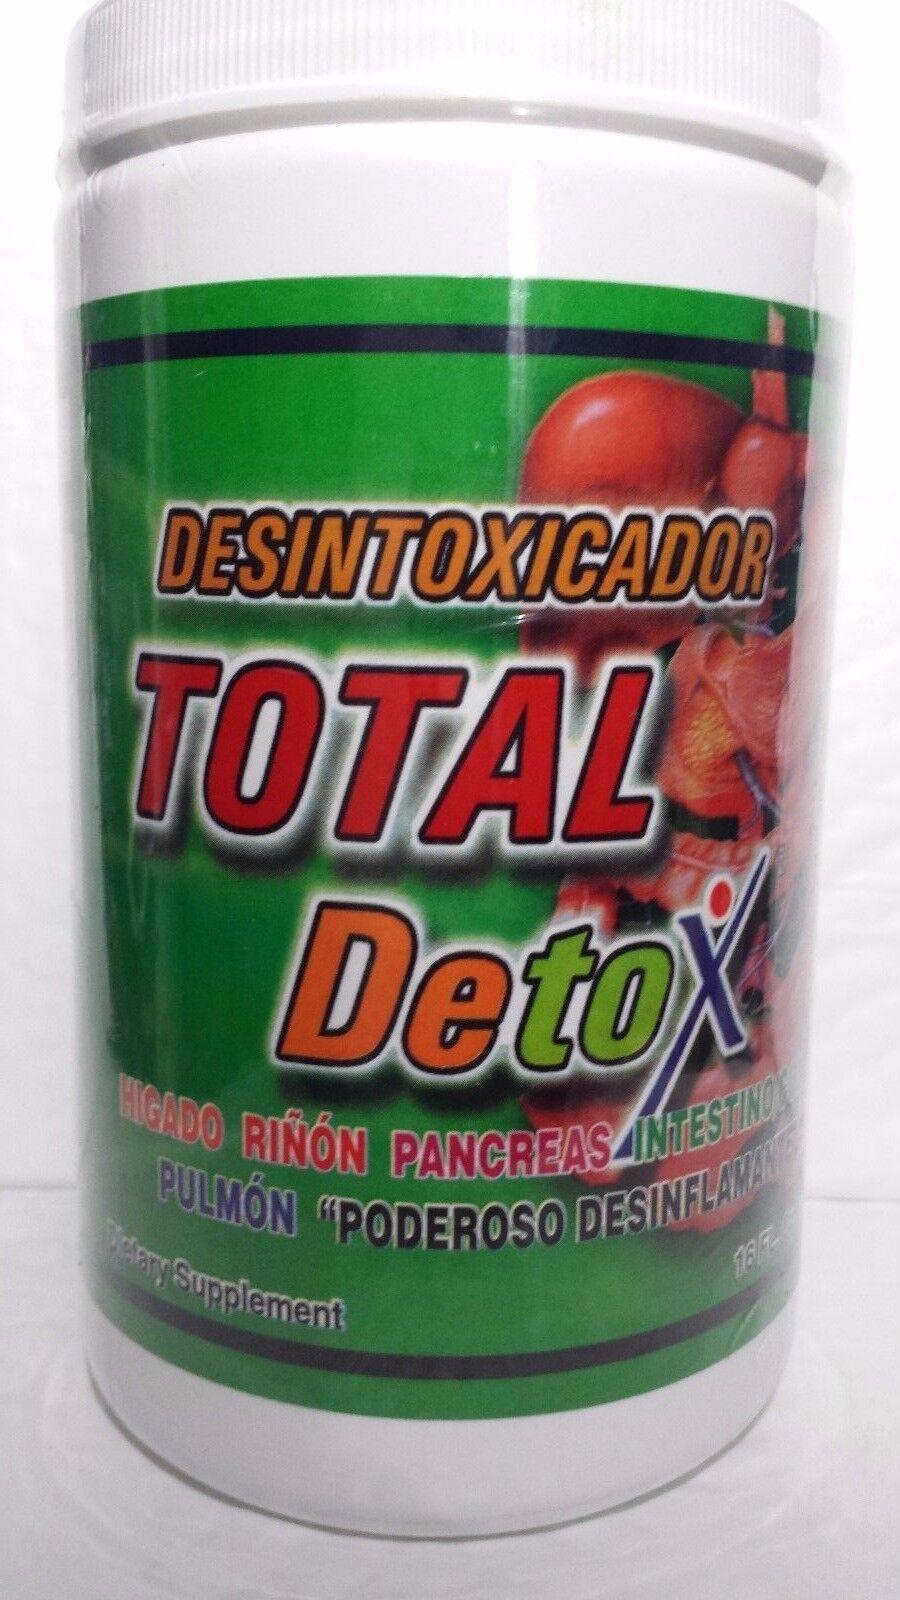 total detox desintoxicador